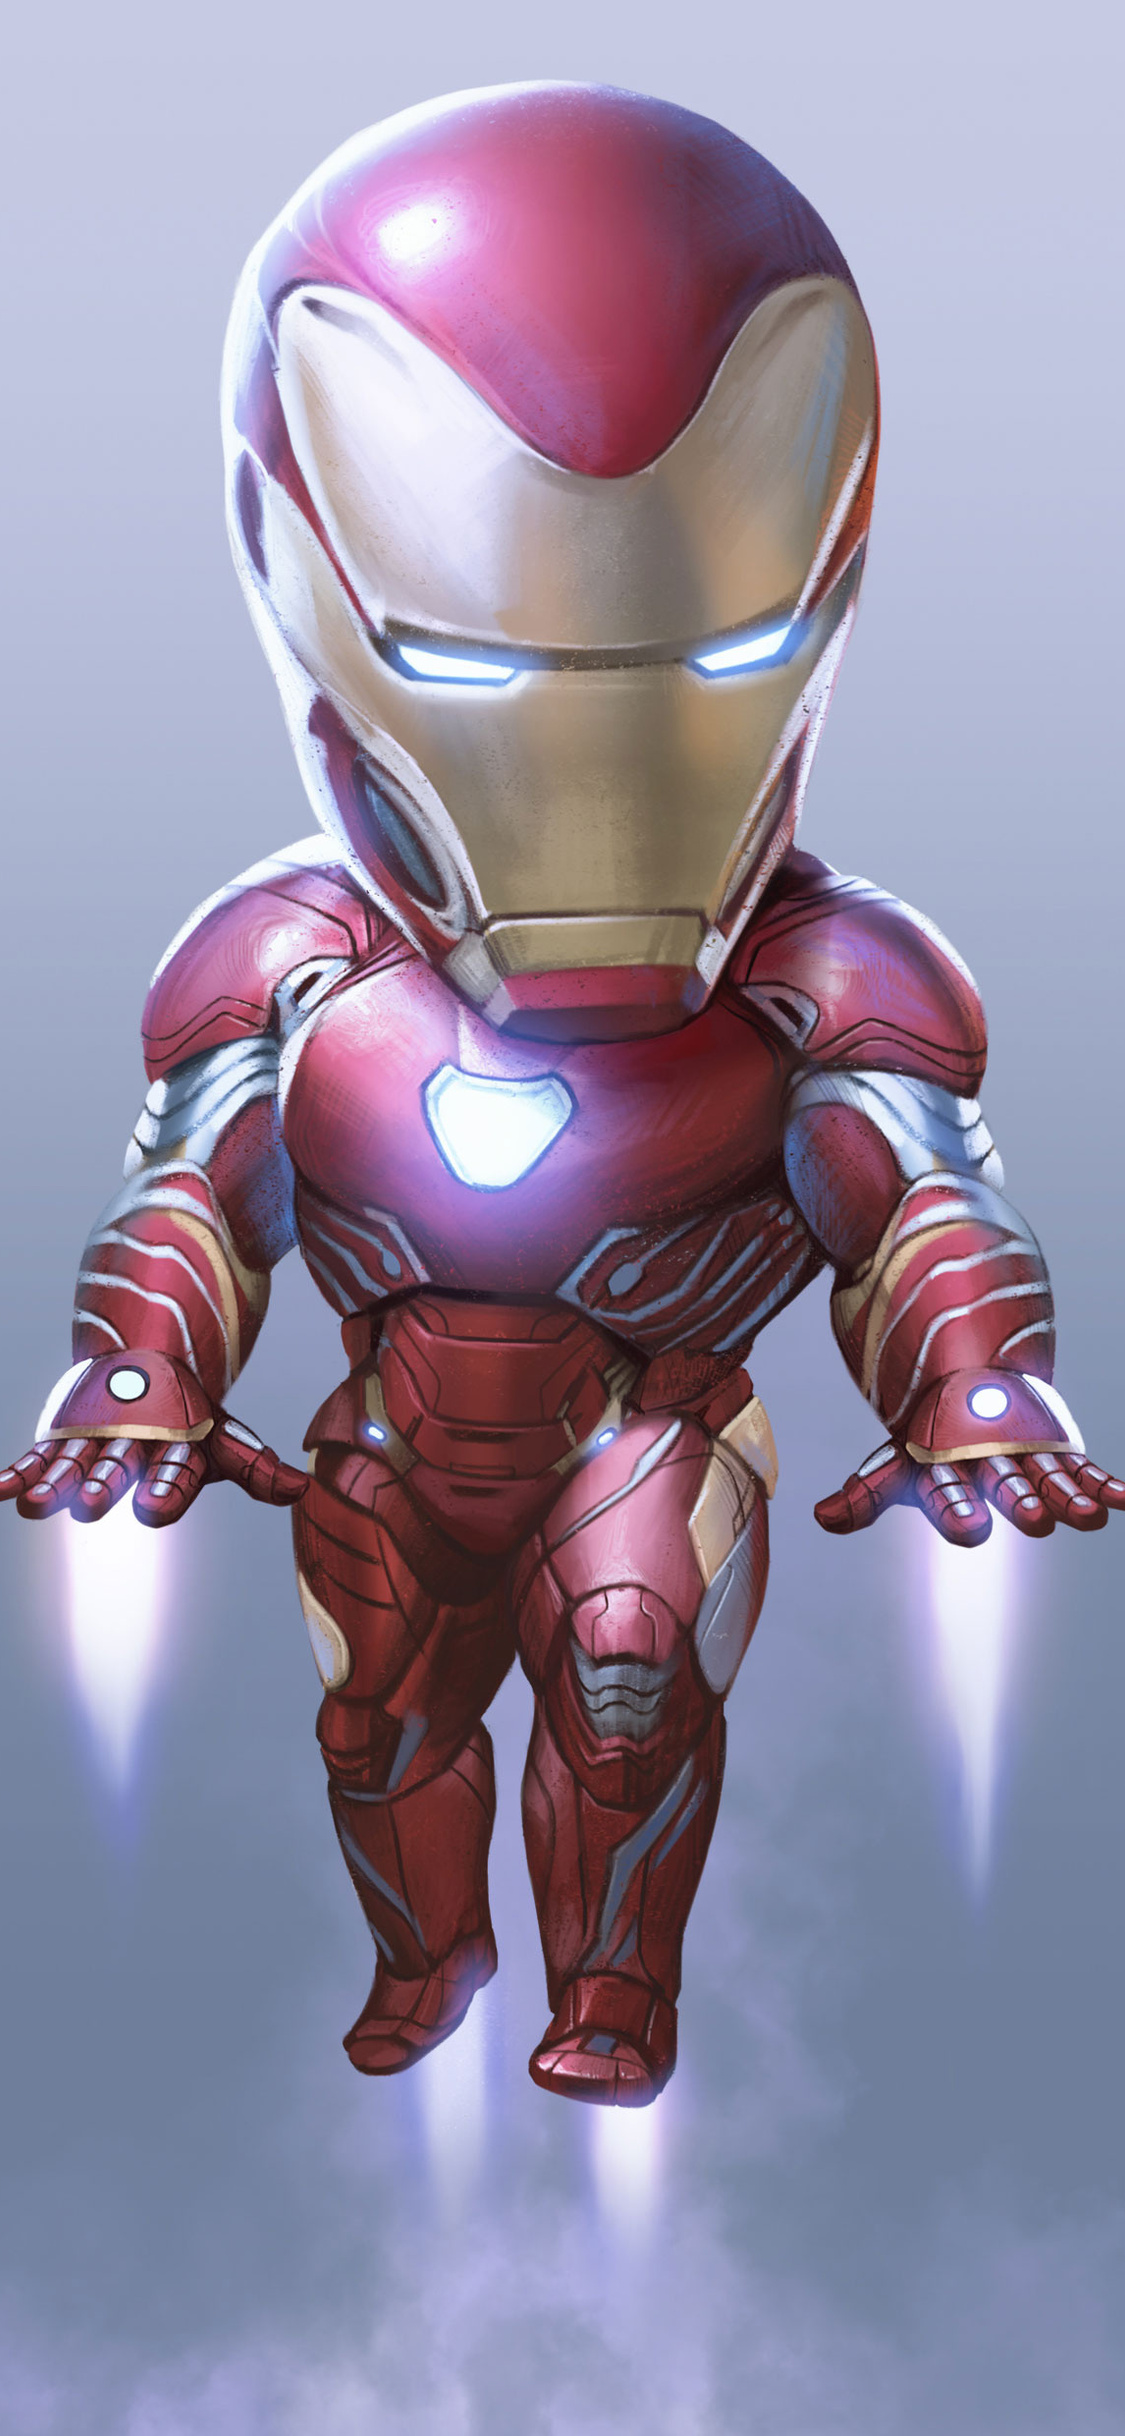 Wallpaper Hd Iphone X Wallpaper Hd Iron Man